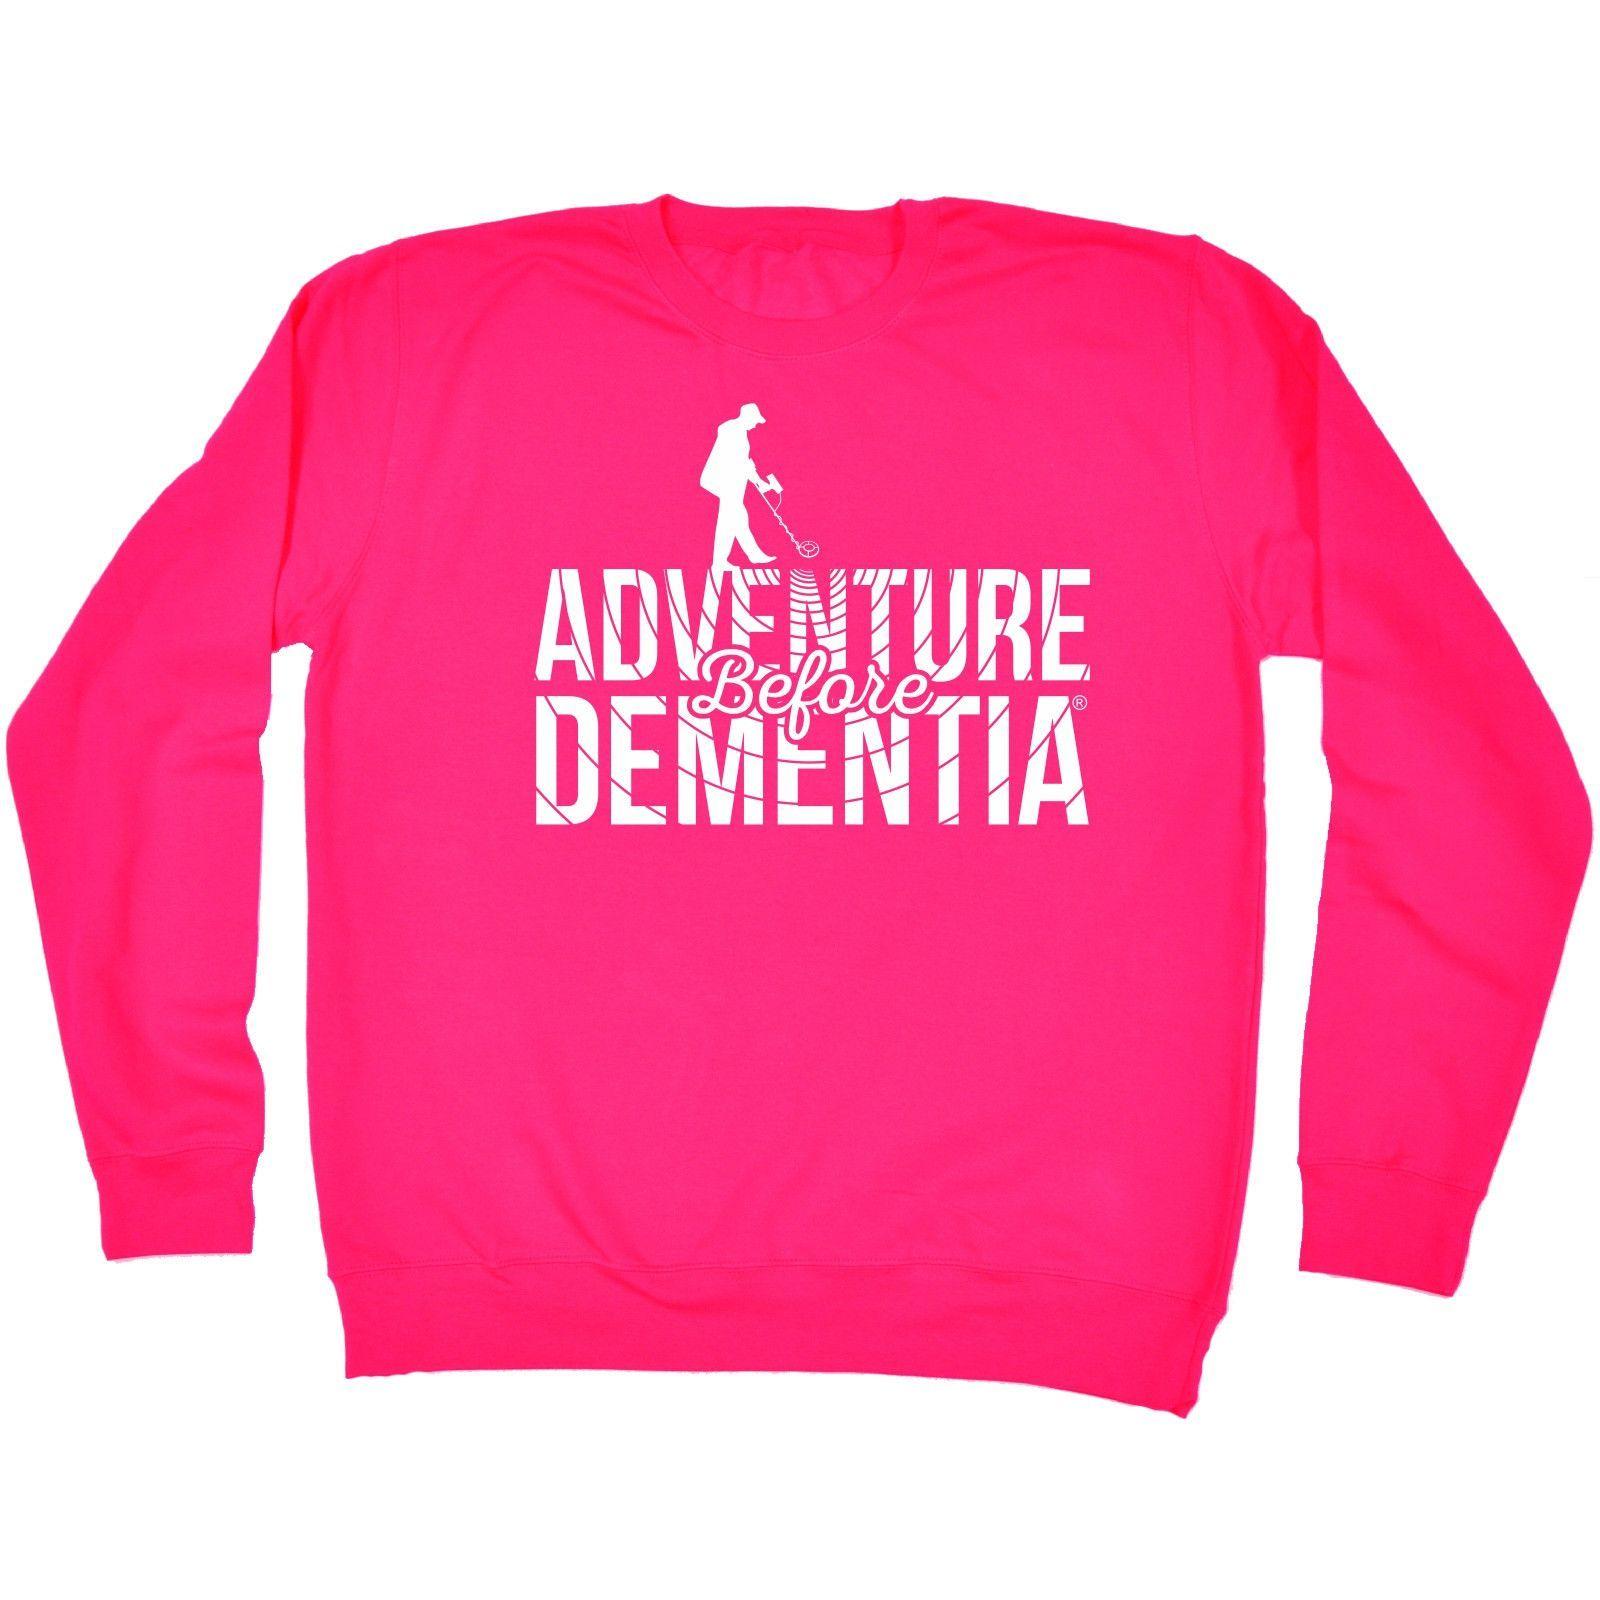 123t USA Adventure Before Dementia Metal Detector Funny Sweatshirt